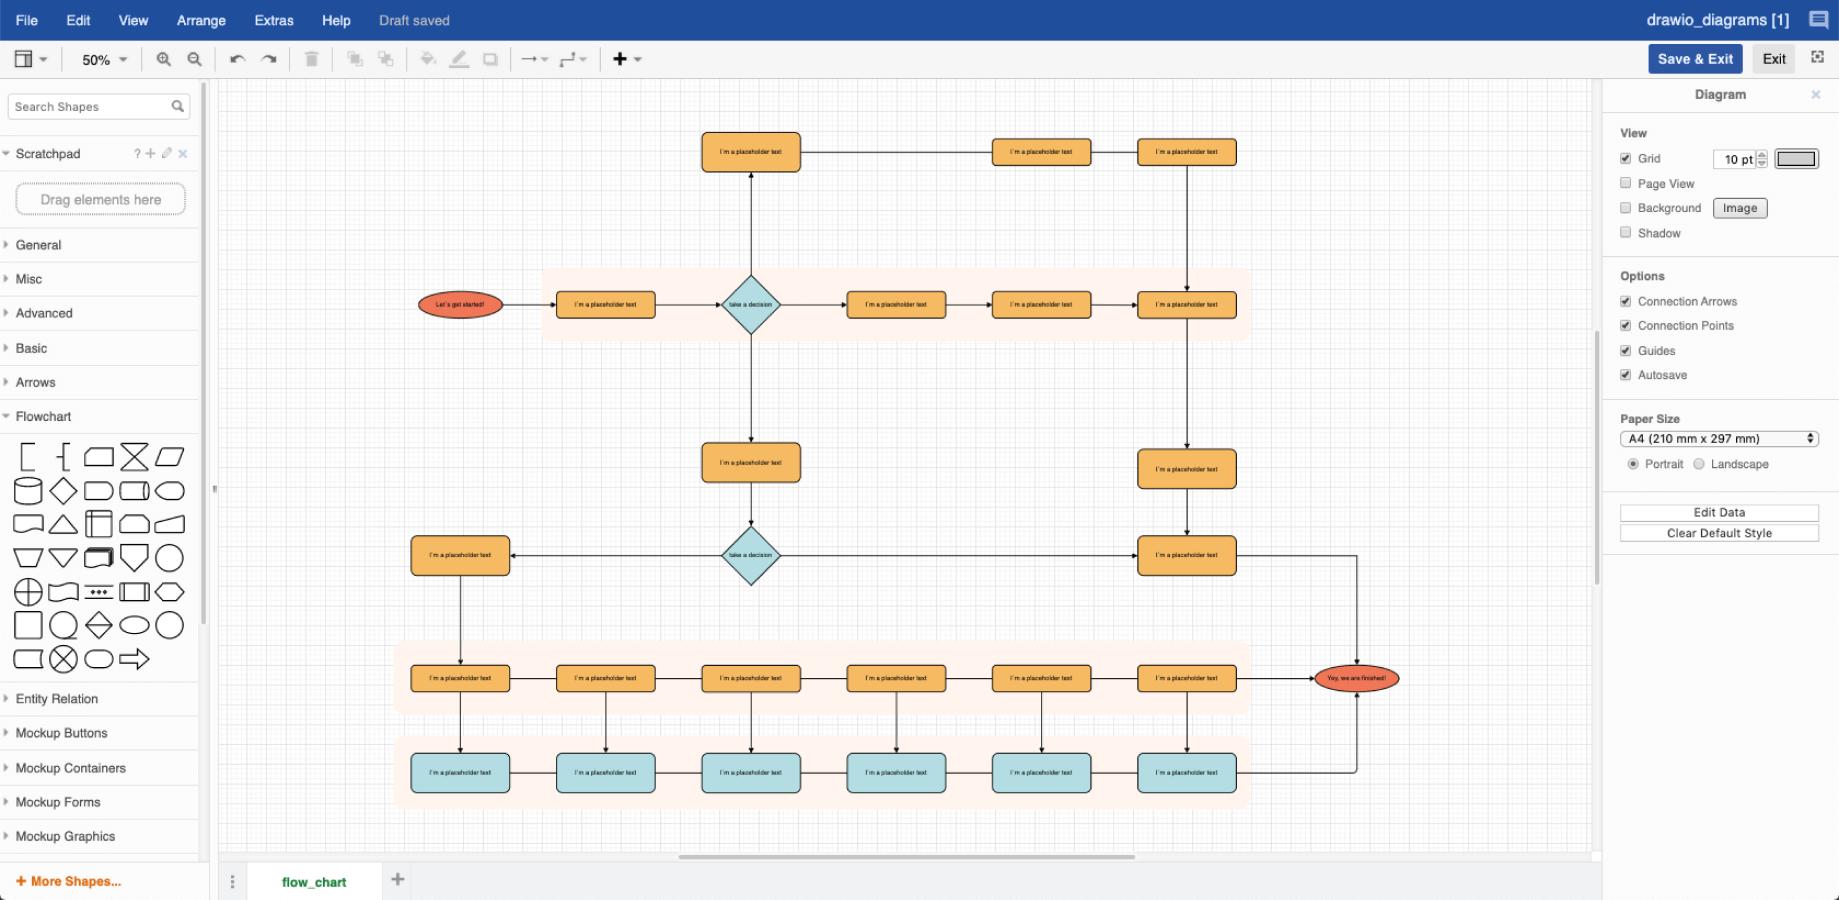 Sample process diagram courtesy of Draw.io